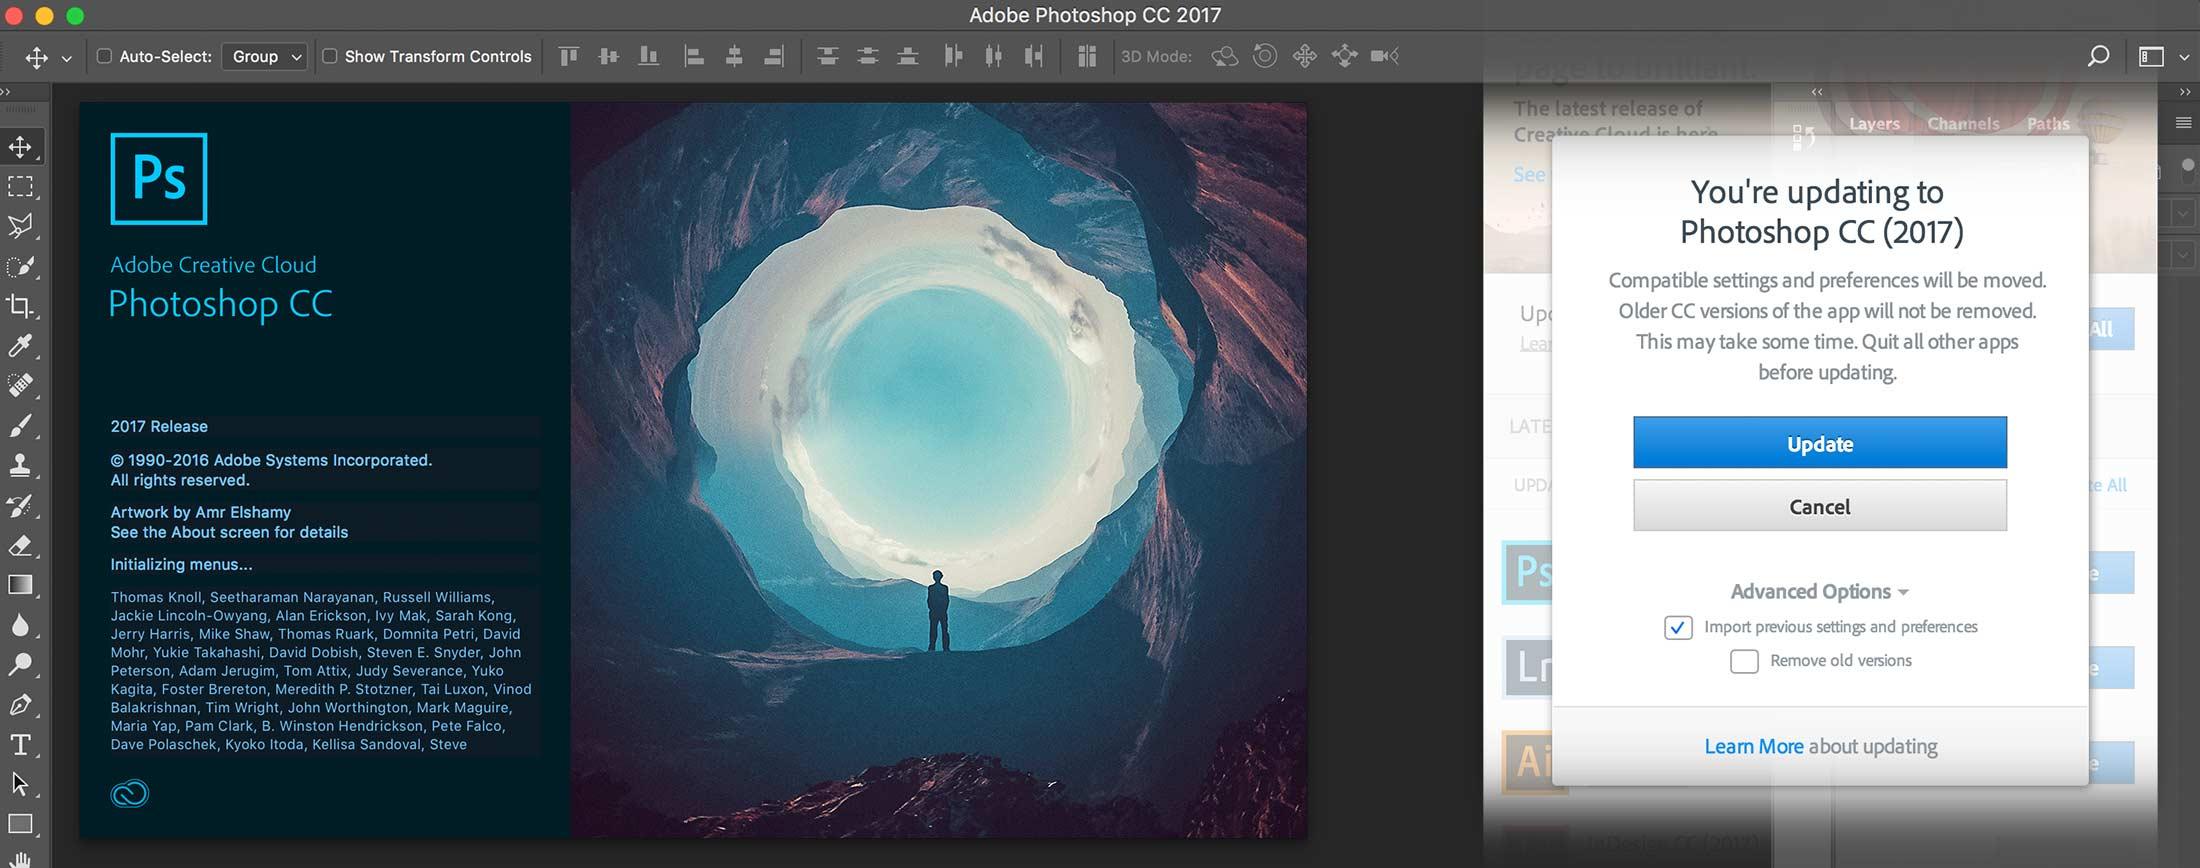 New Photoshop CC 2017 interface